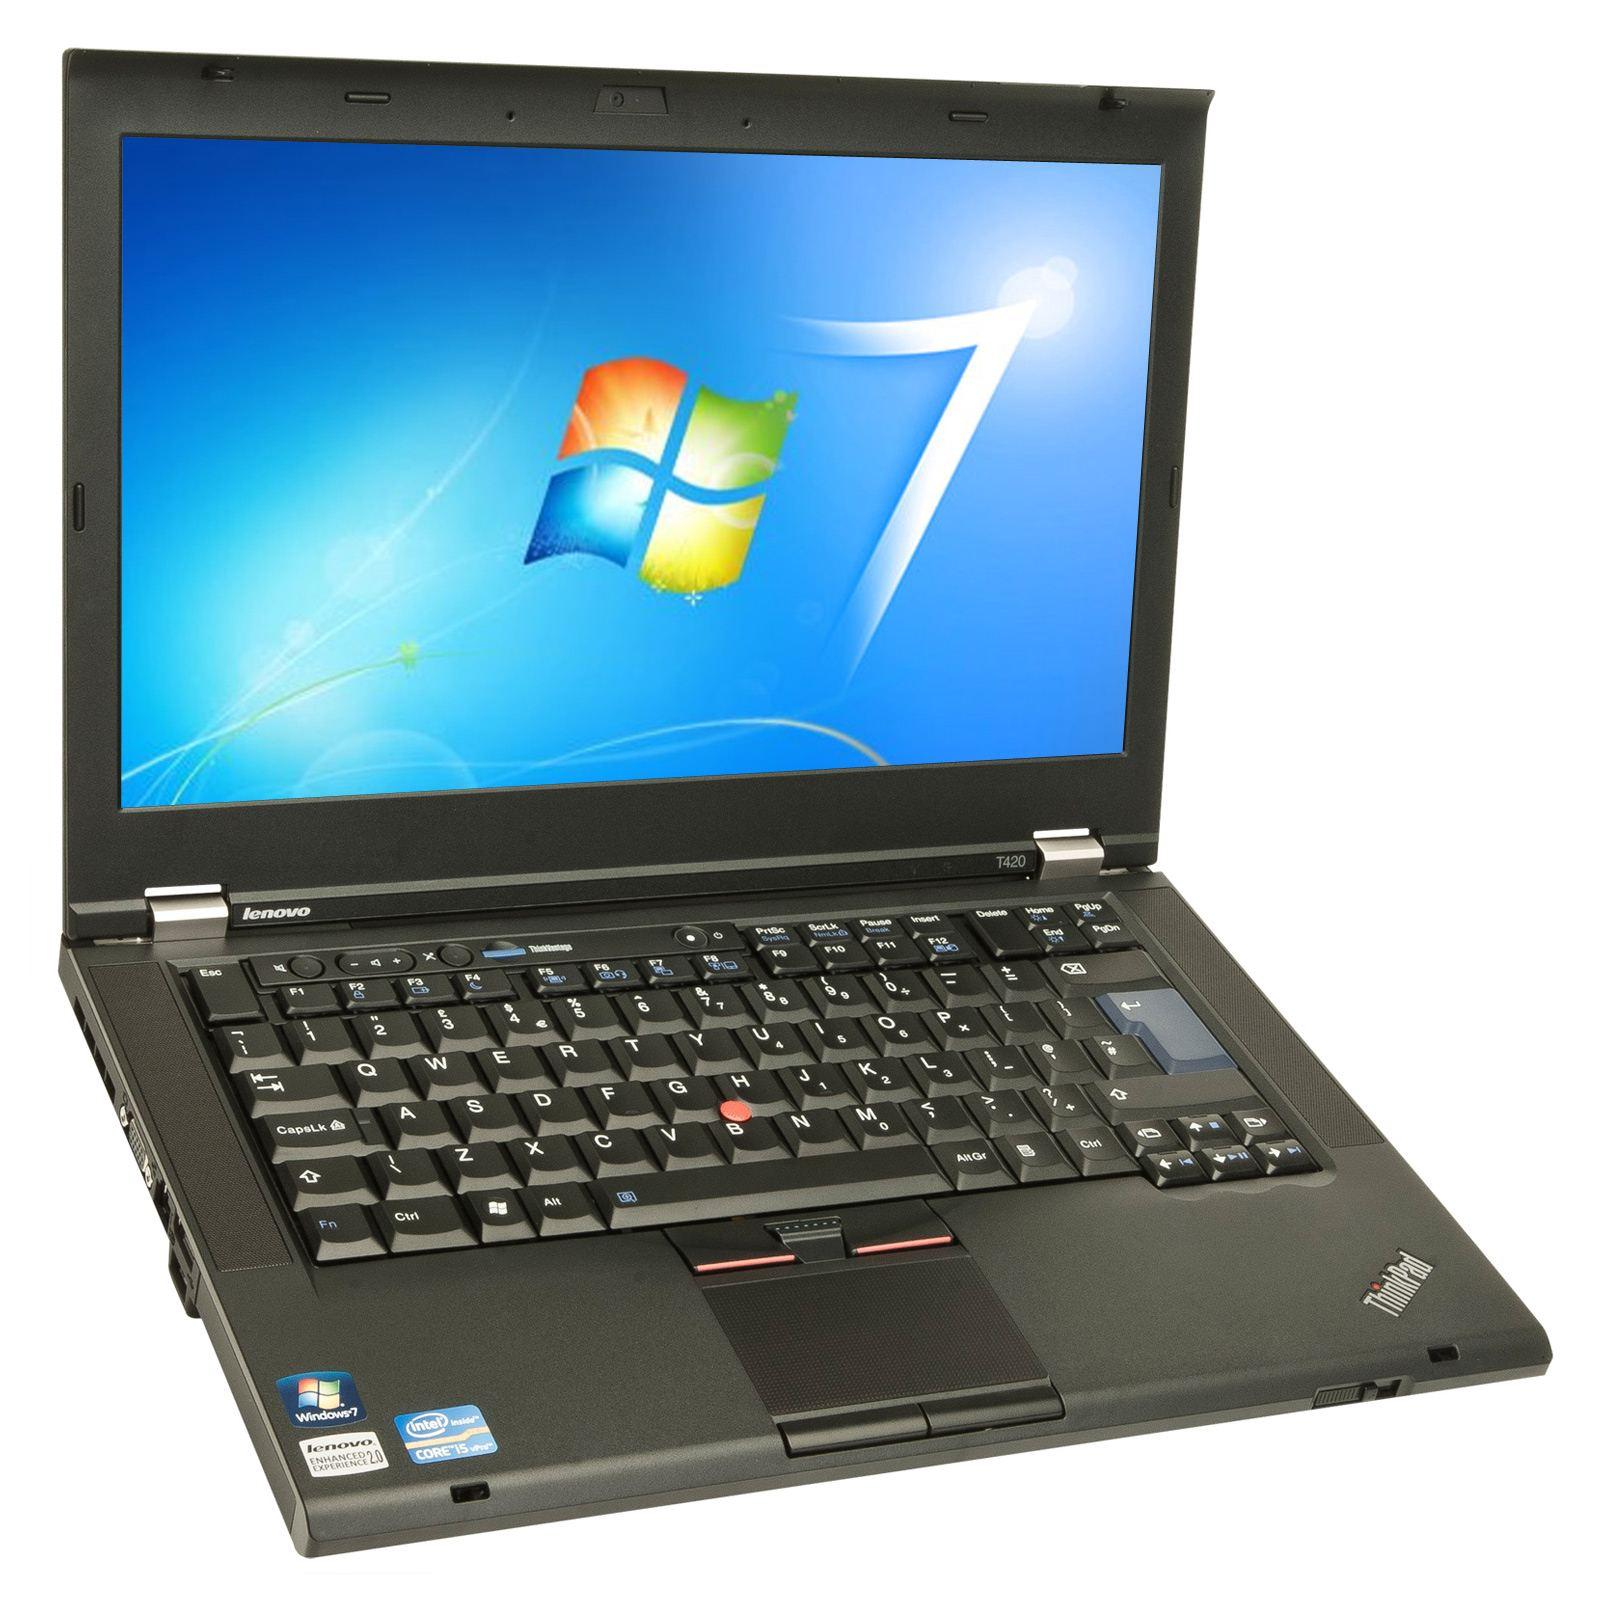 lenovo thinkpad t420 bios bin file